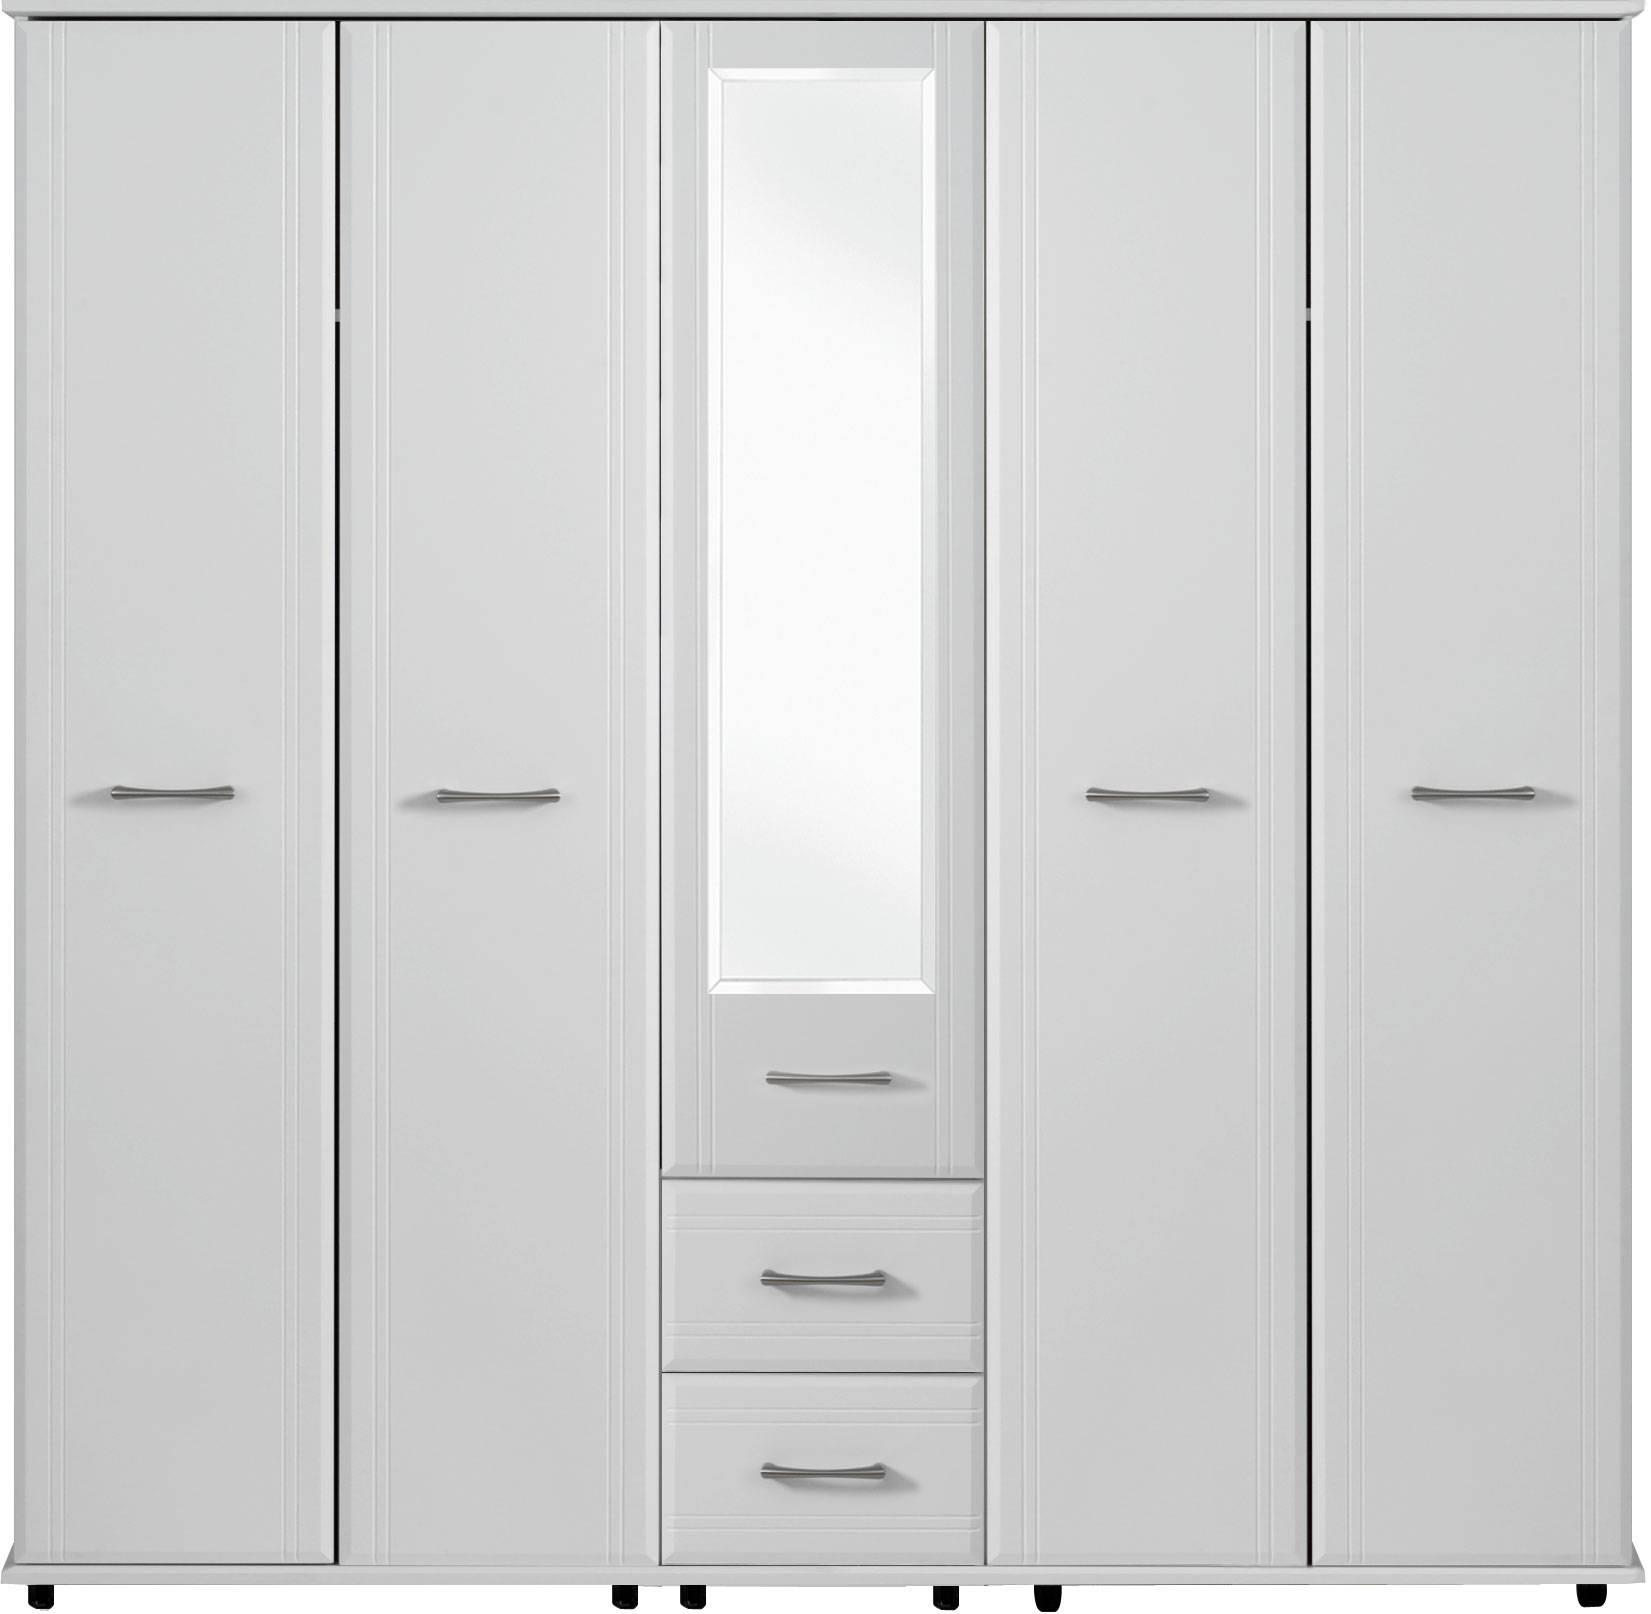 Dorchester 5 Door Wardrobe 1 Mirror 2 Drawers | Crendon Beds inside 4 Door Wardrobes With Mirror And Drawers (Image 5 of 15)